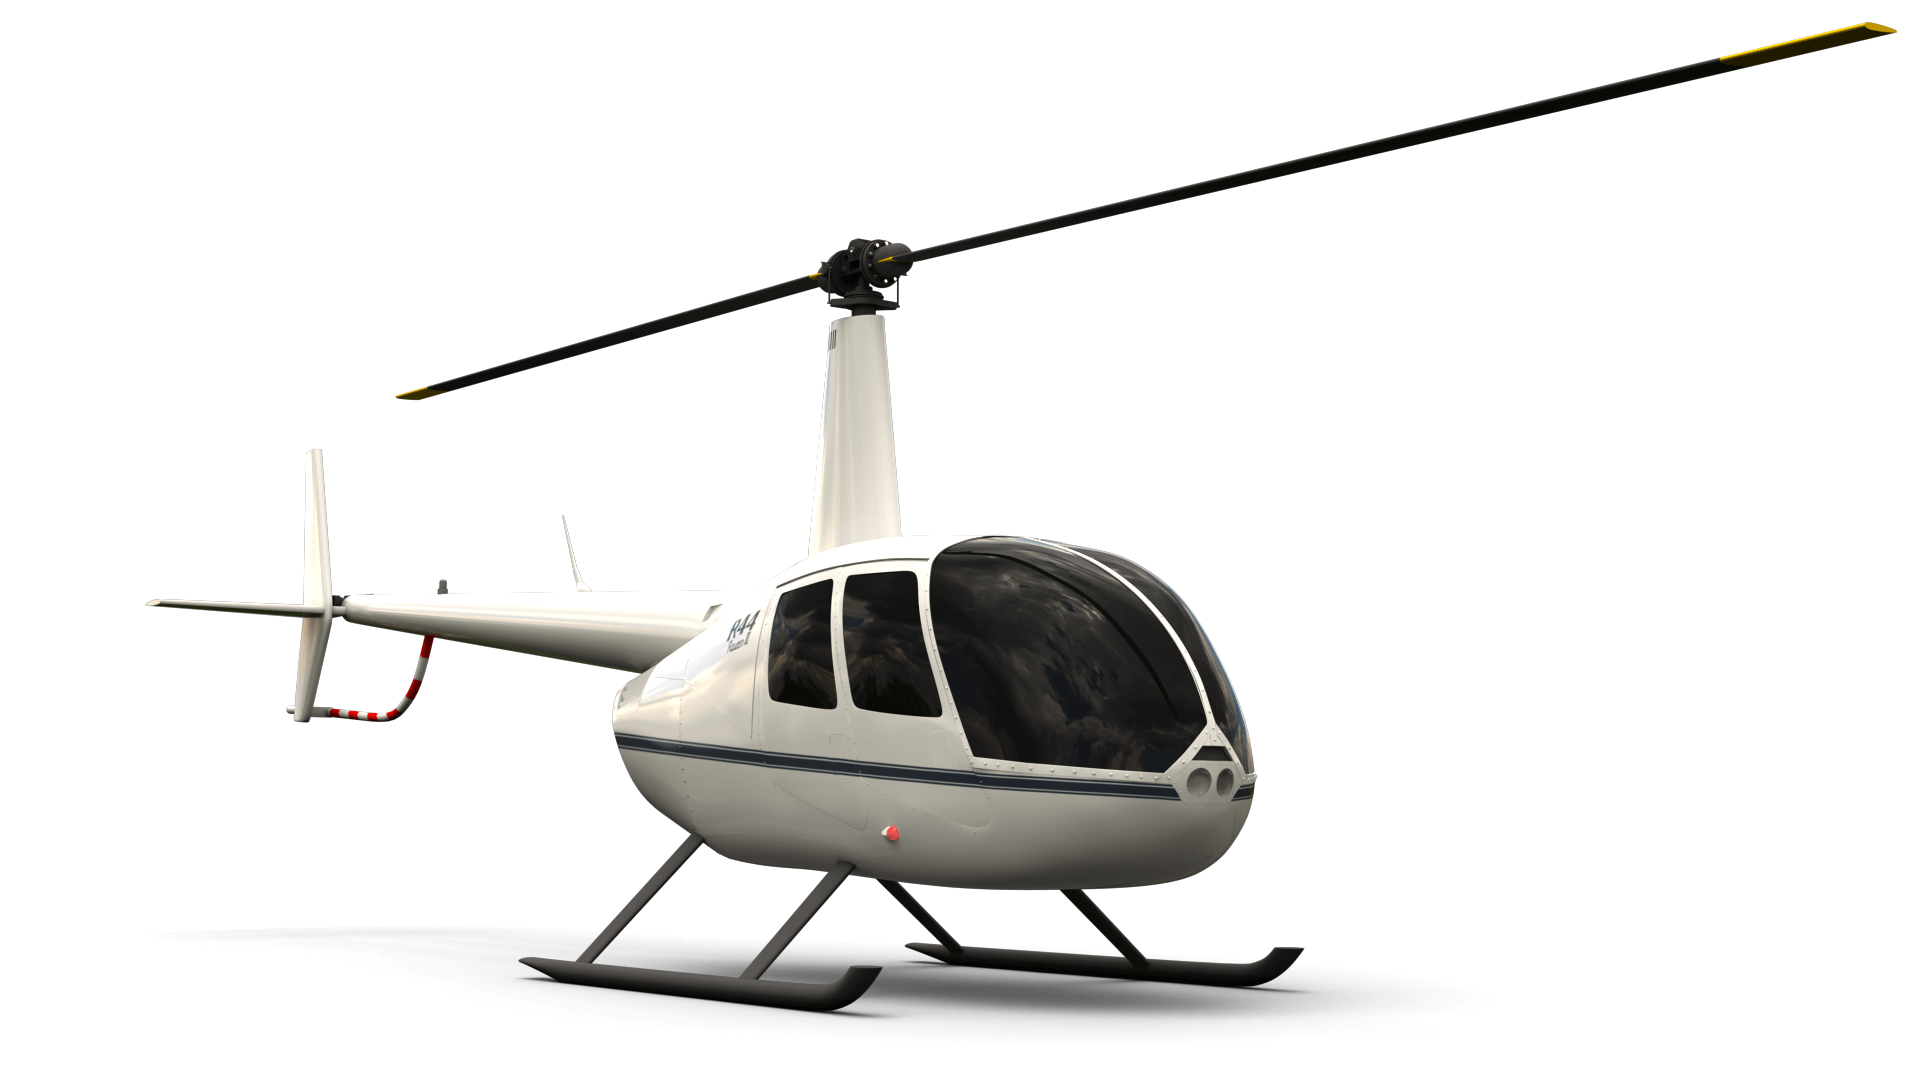 R44-1